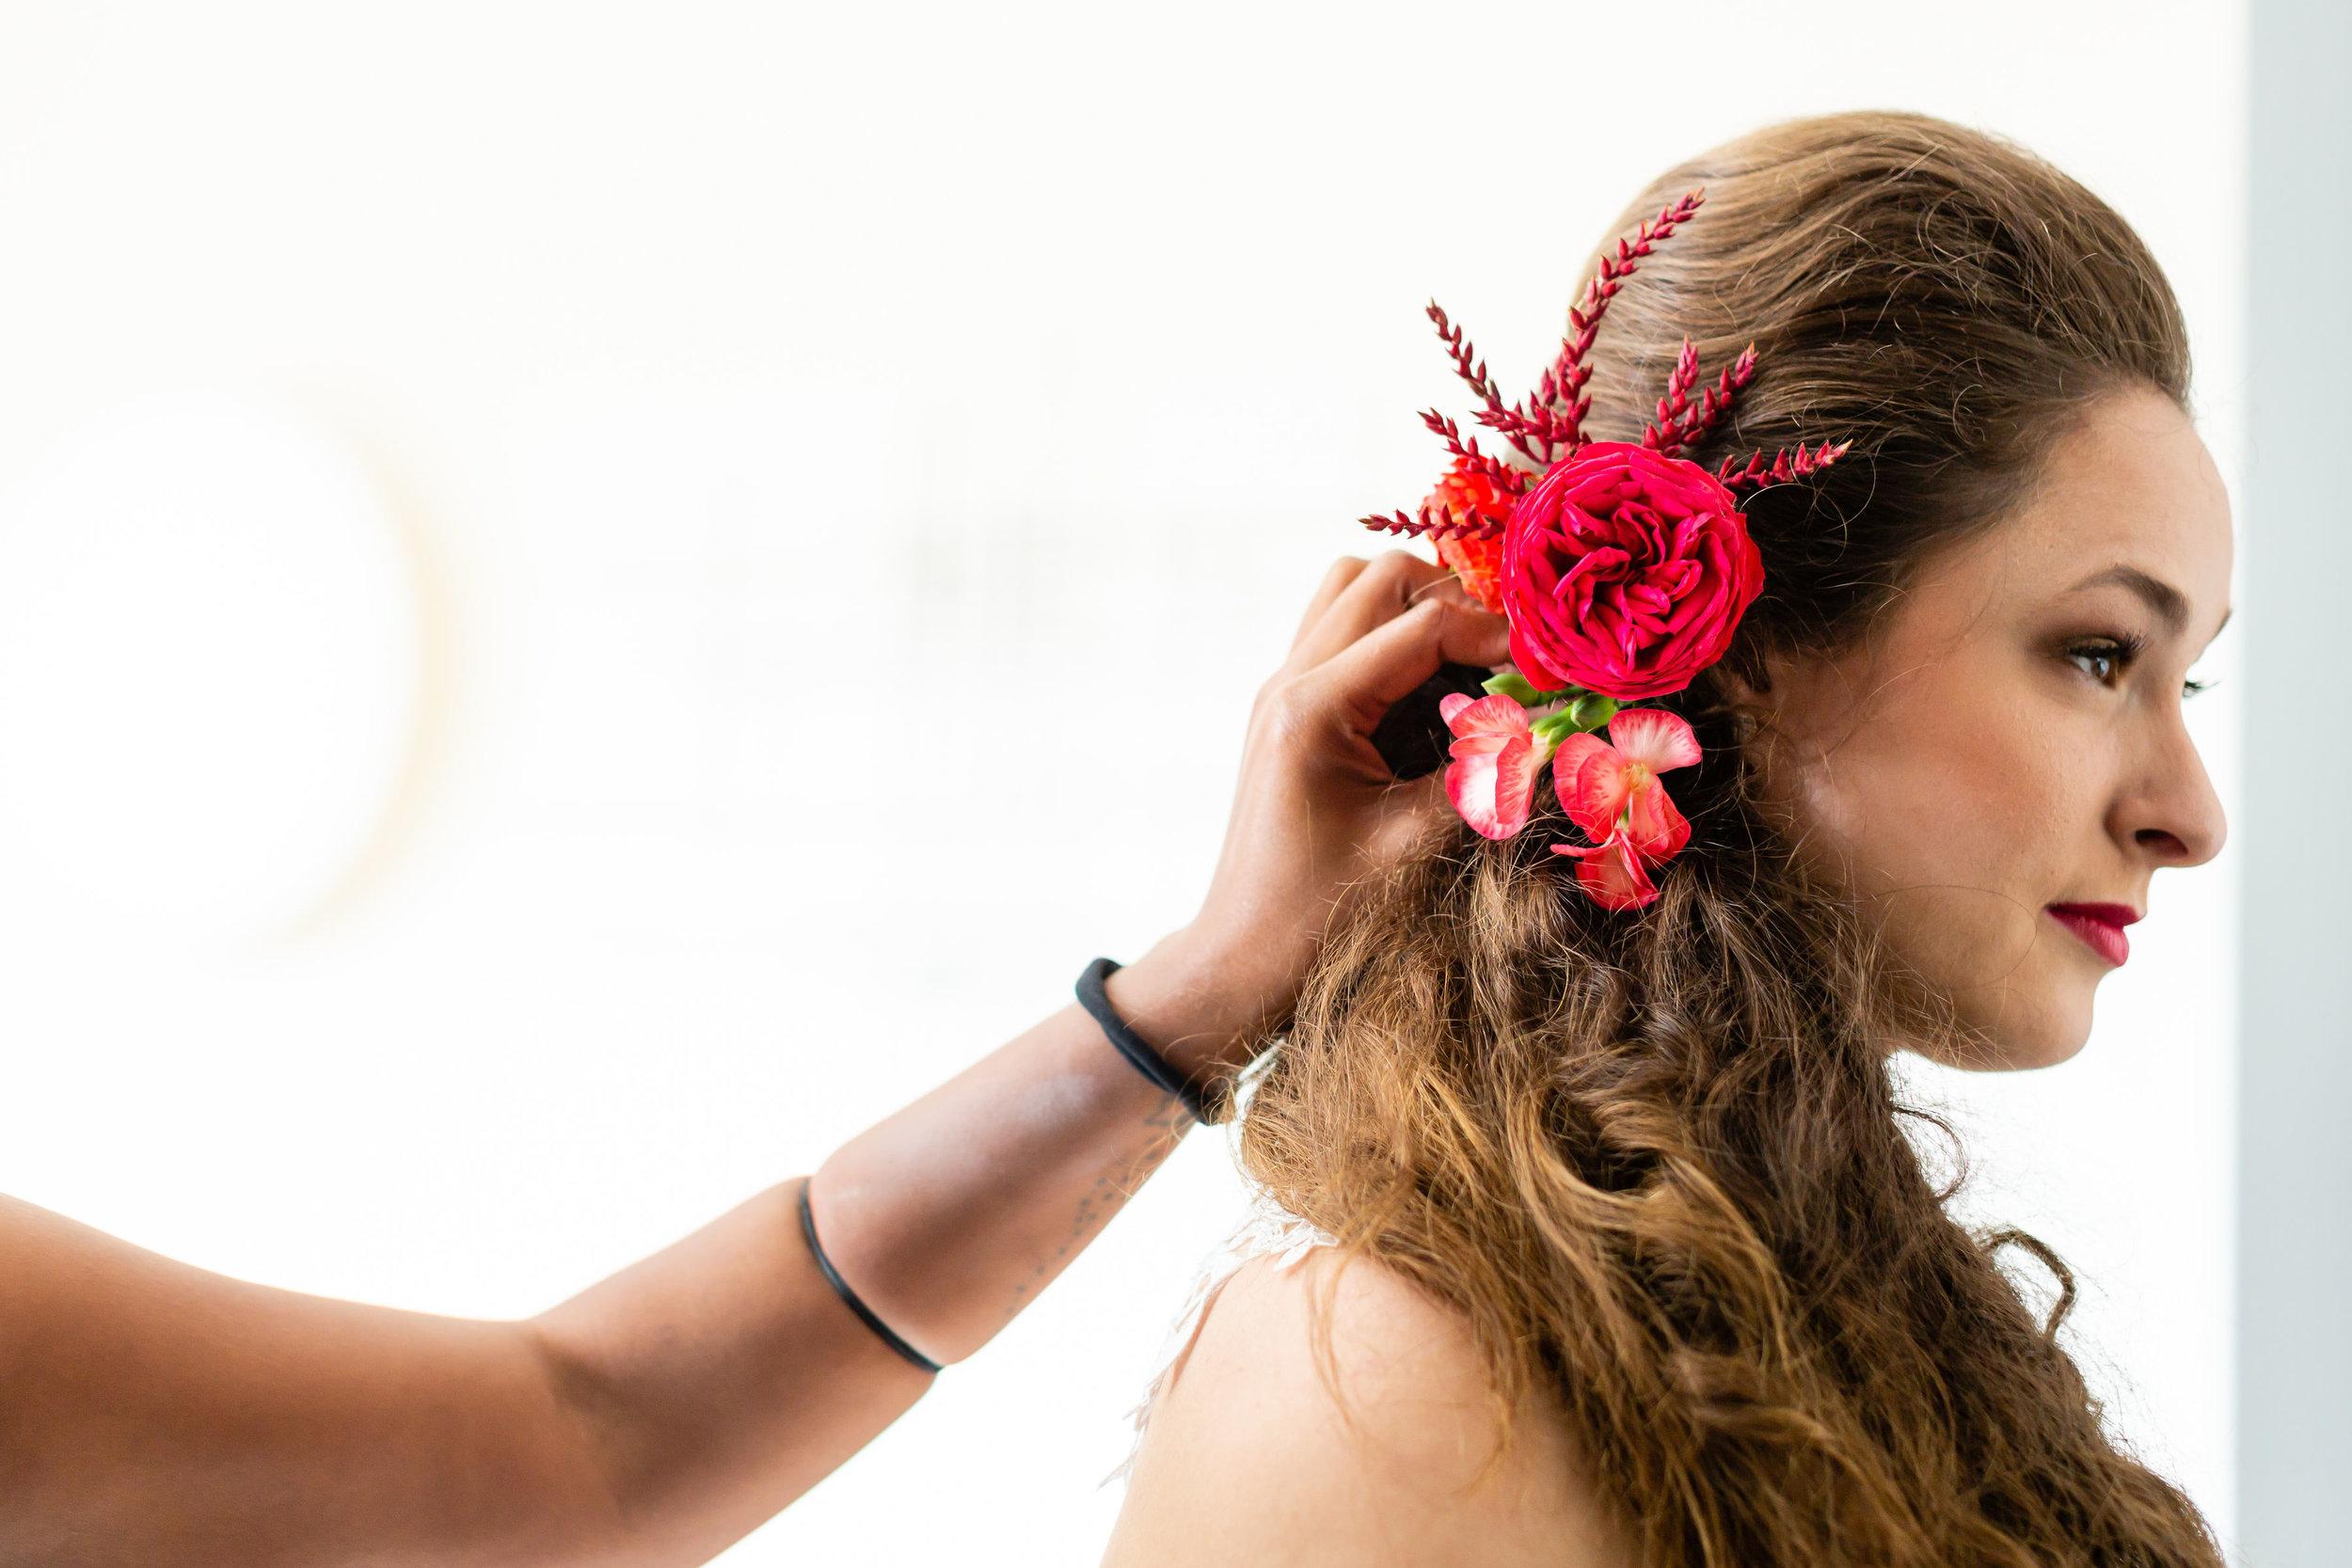 Elizabeth_Joab_multicultural_wedding_Petronella_Photography_144.jpg